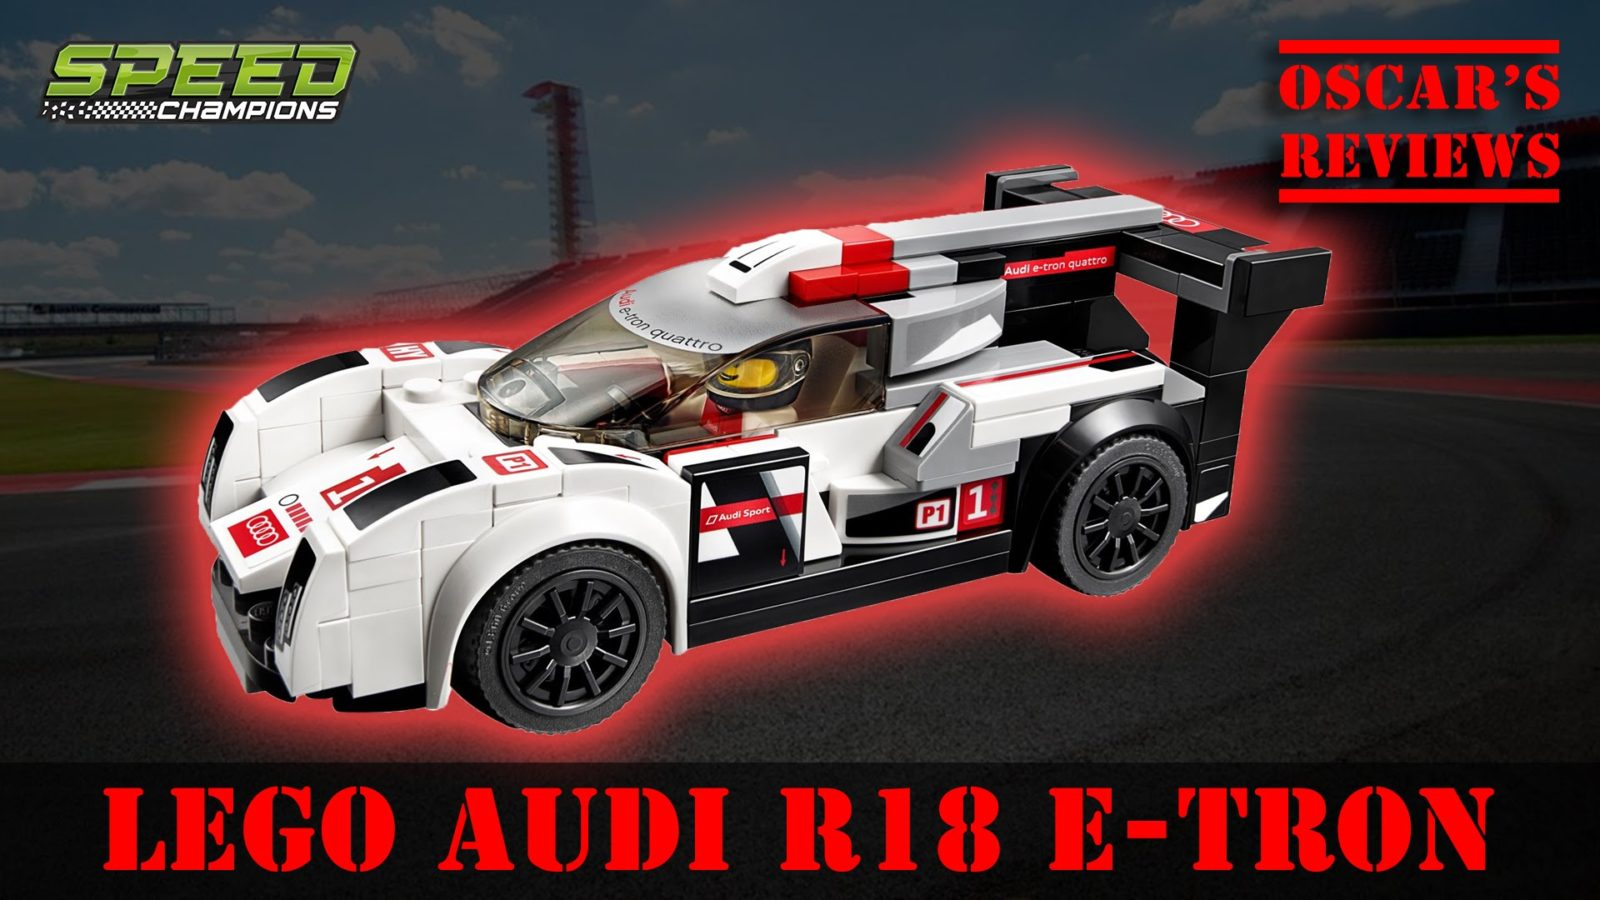 Lego Speed Champions – Audi R18 e-tron quattro (75872) – A Kid's Review